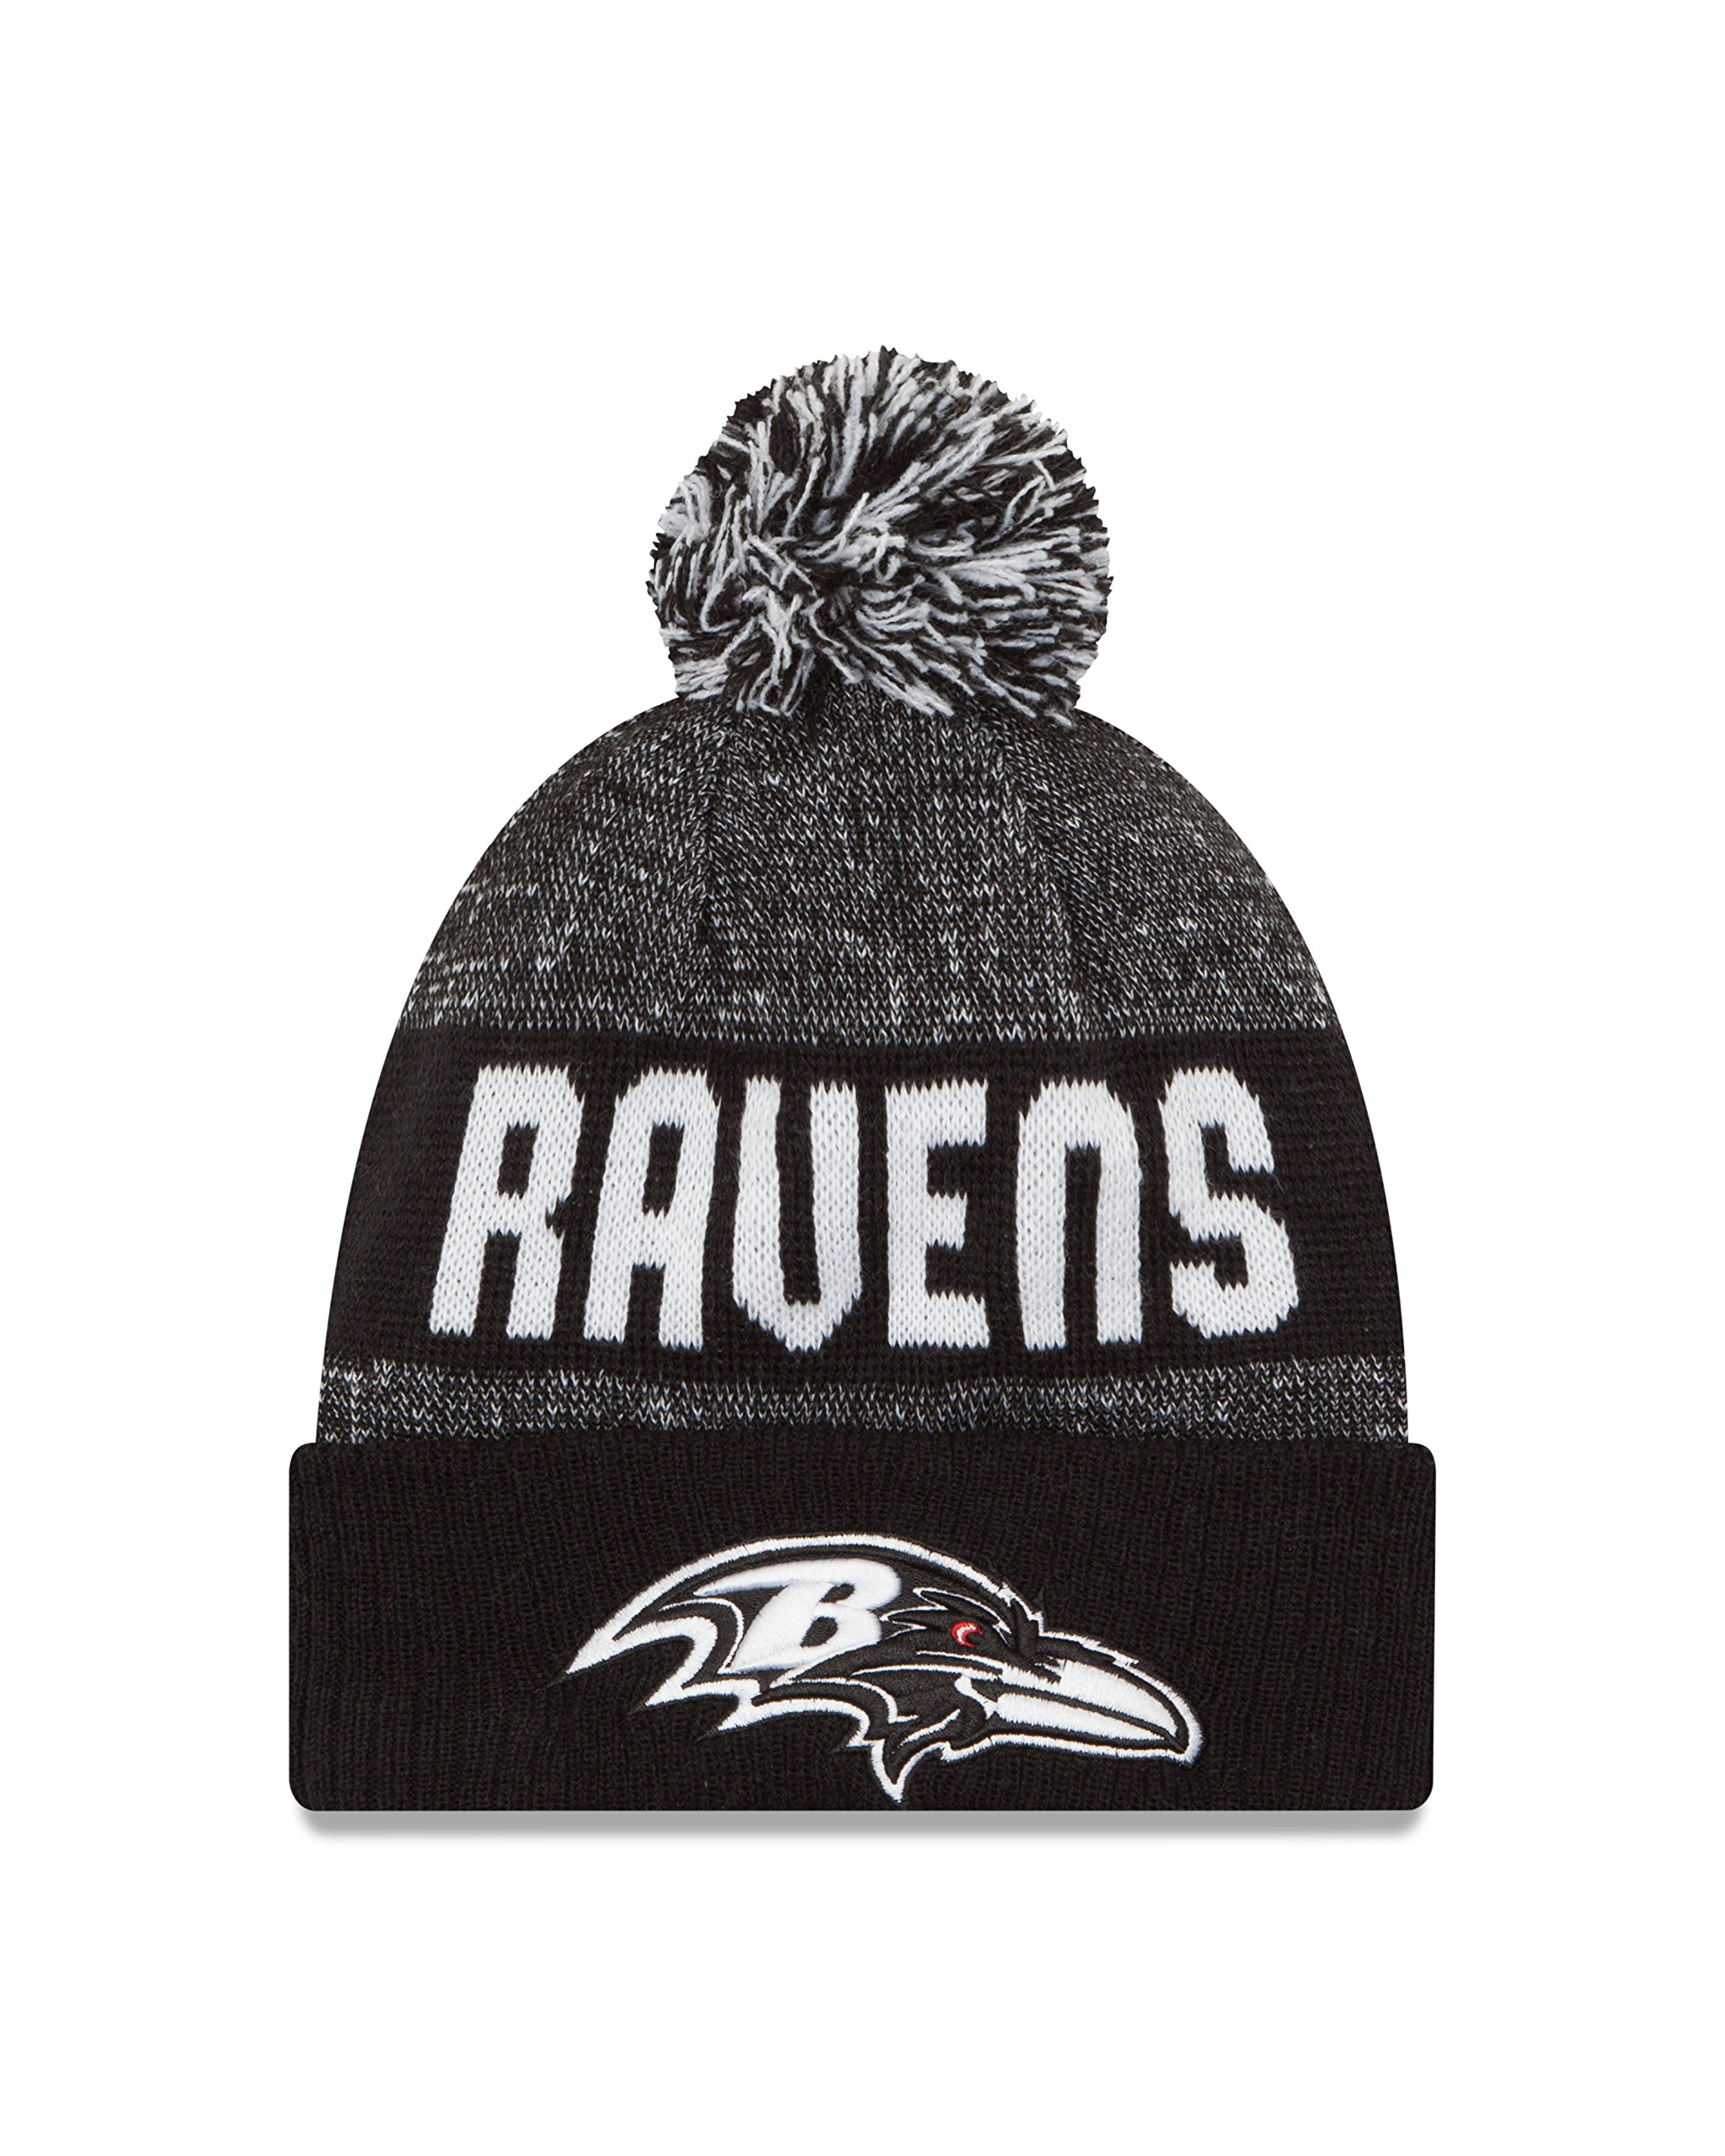 New Era NFL Baltimore Ravens 2016 Sport Knit Beanie, One Size, Black/White